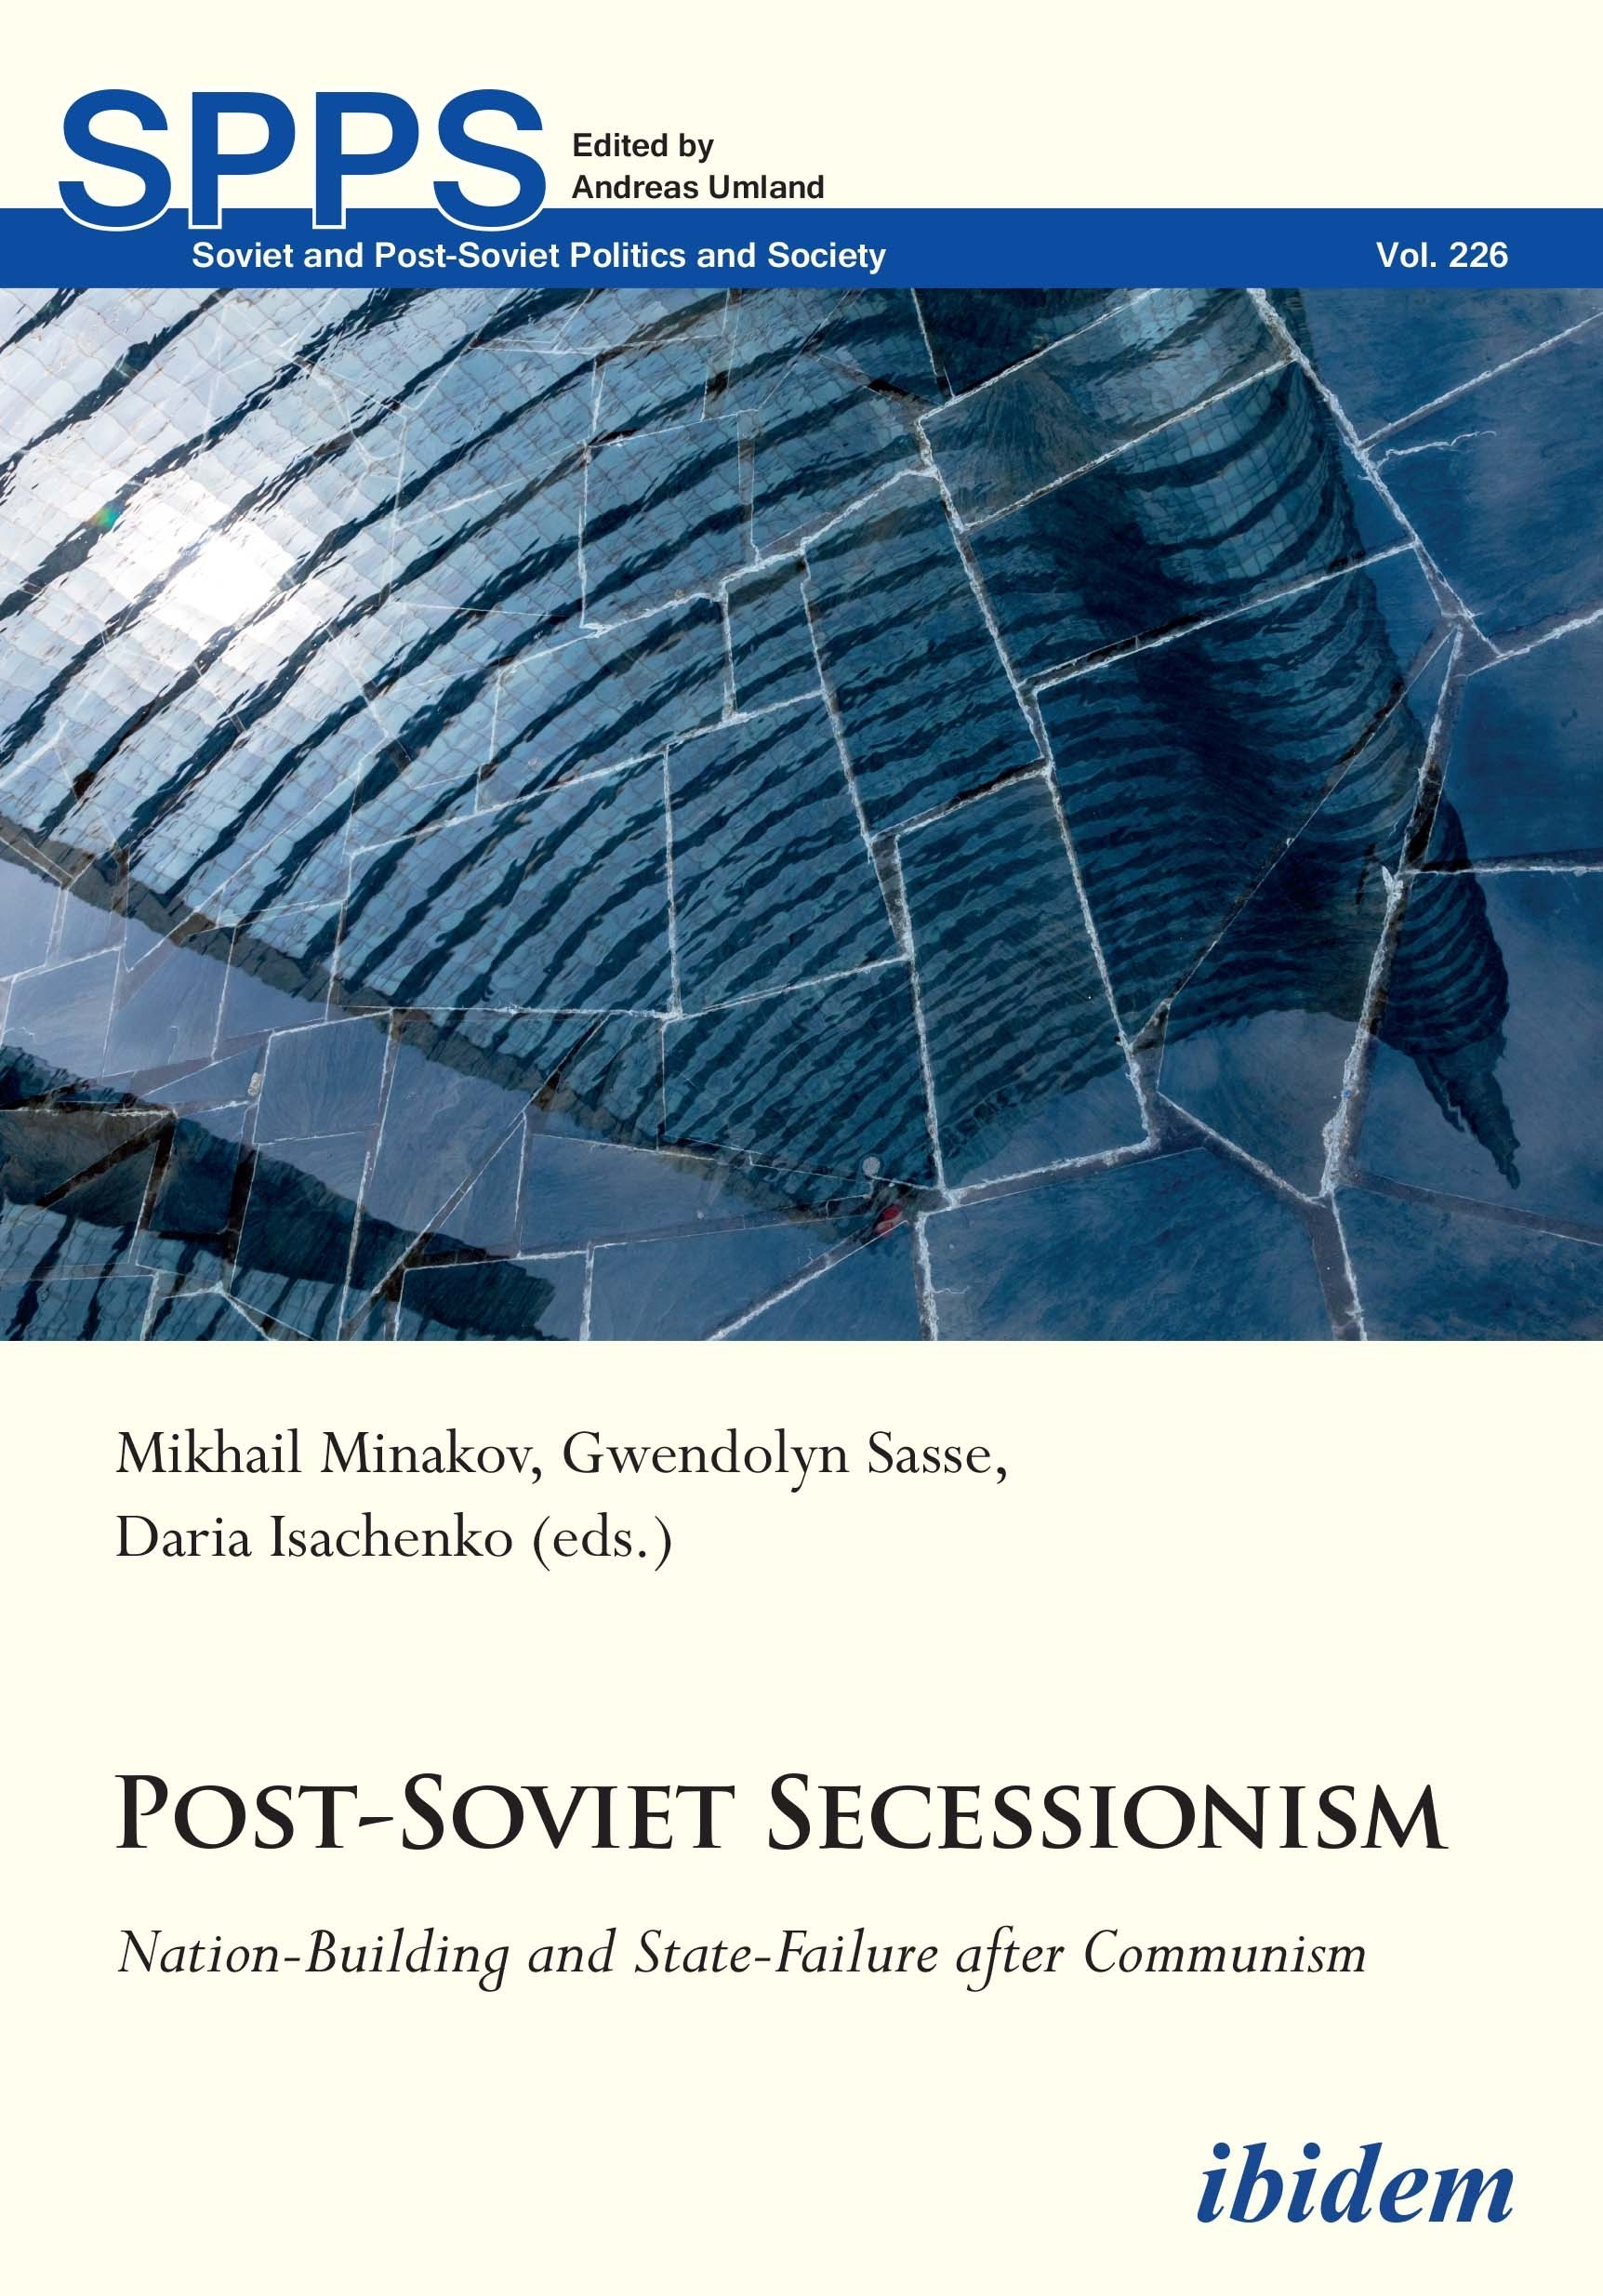 Post-Soviet Secessionism